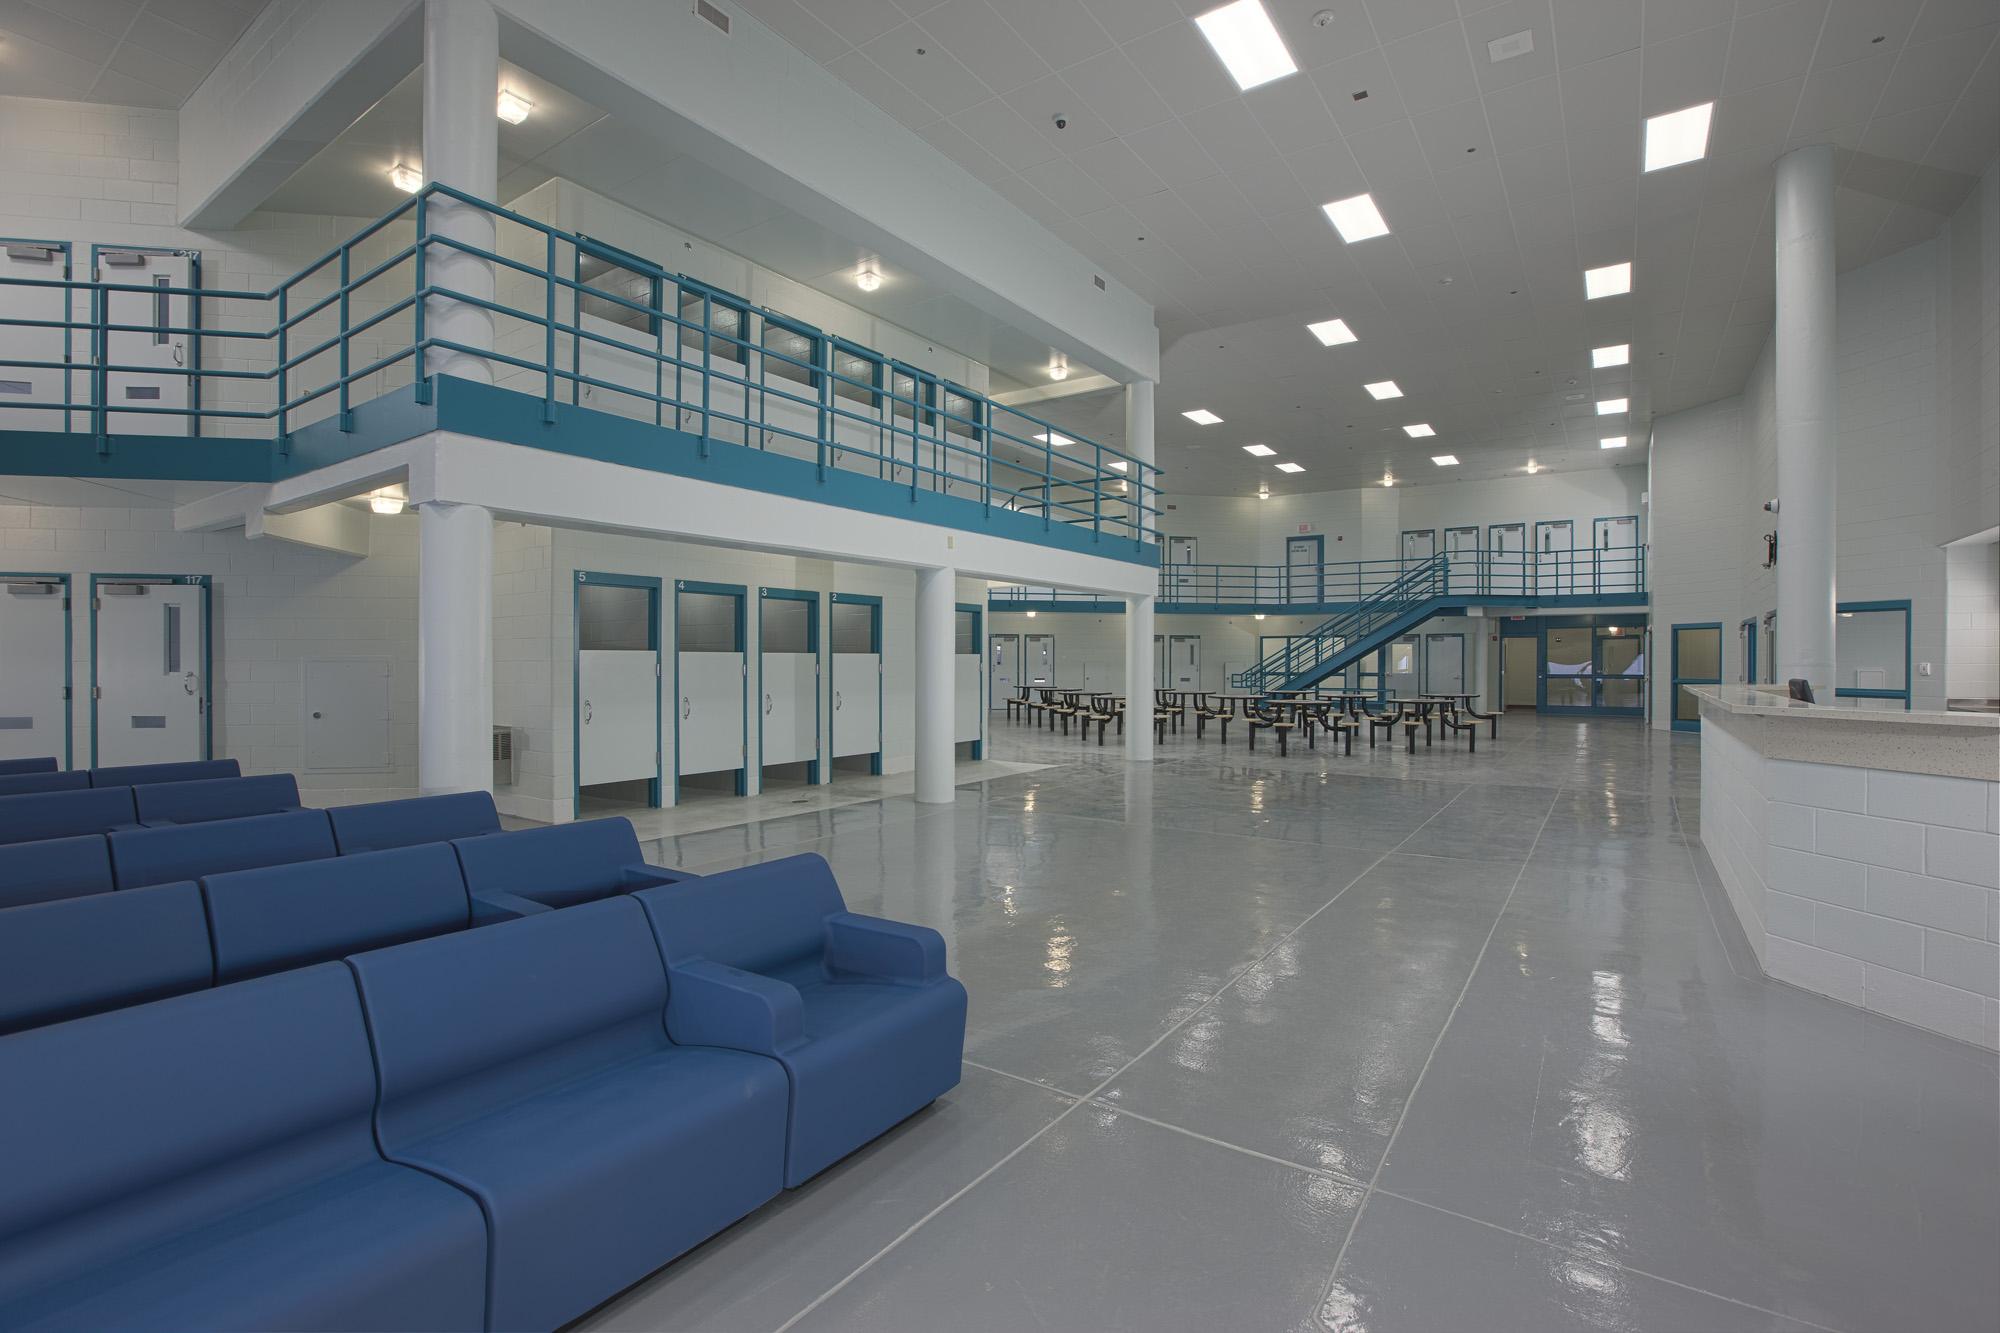 PG County Jail Interior Image R120979.jpg